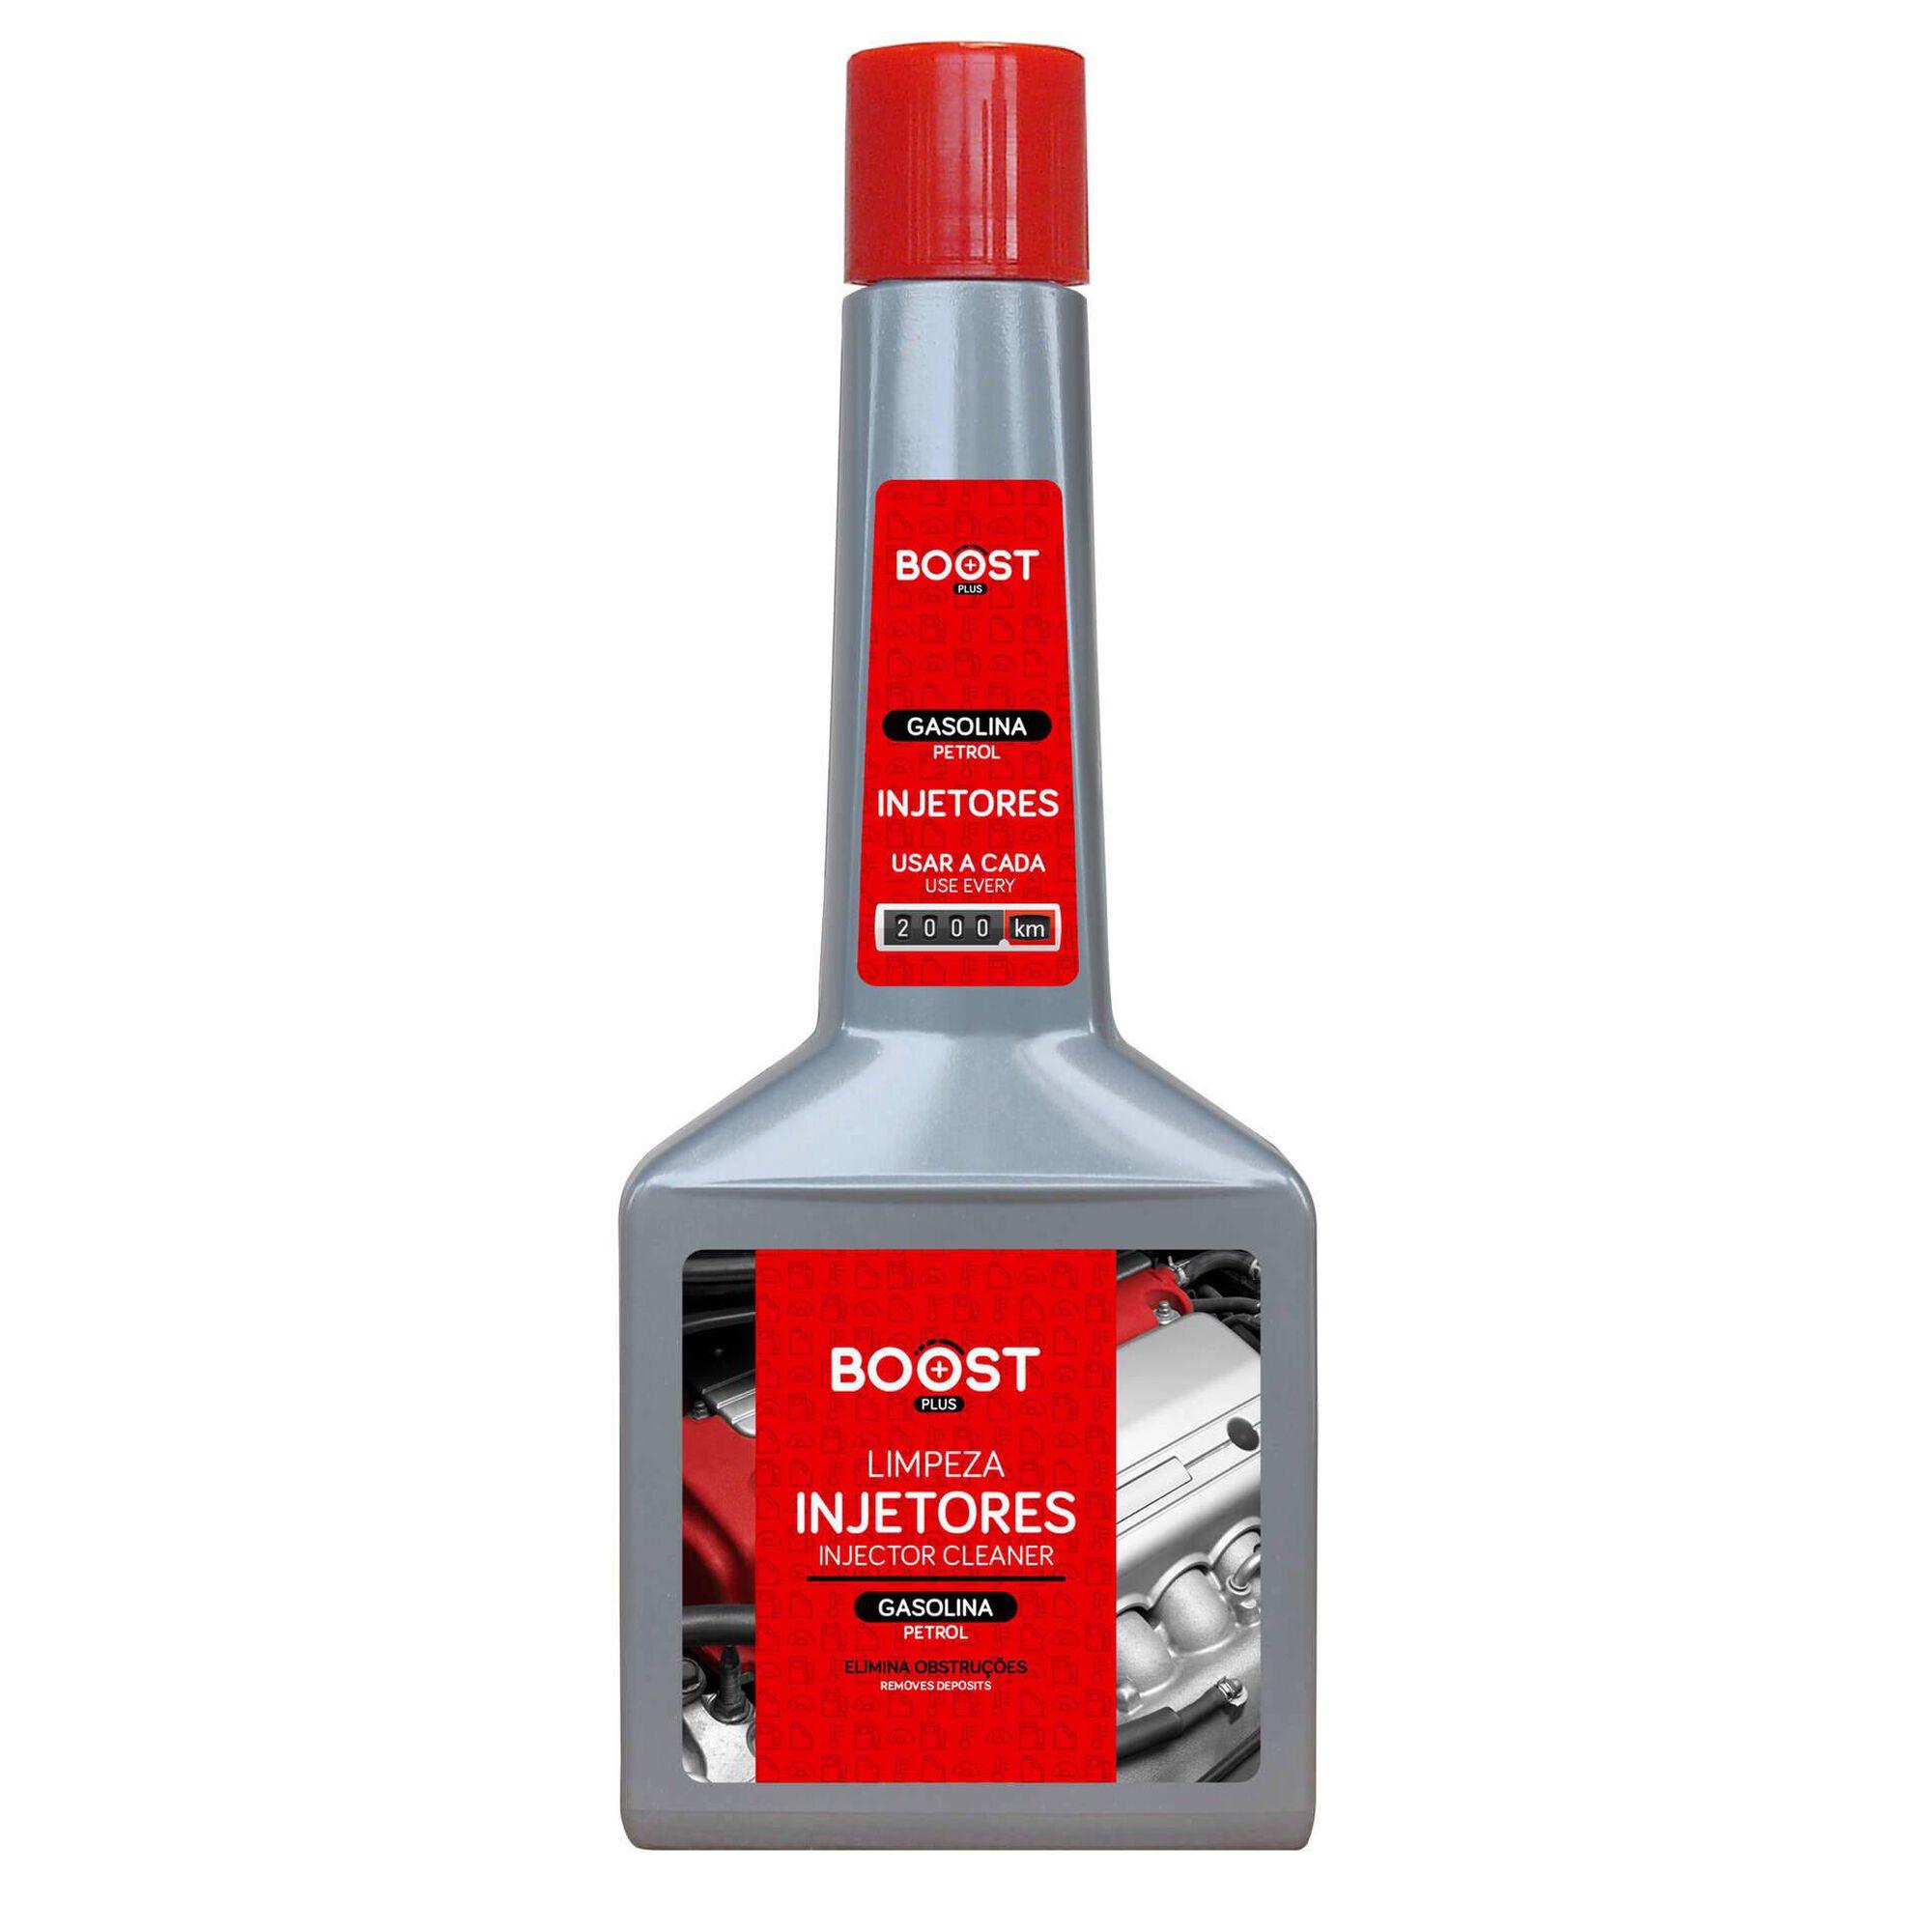 Limpa Injetores Gasolina 250ml